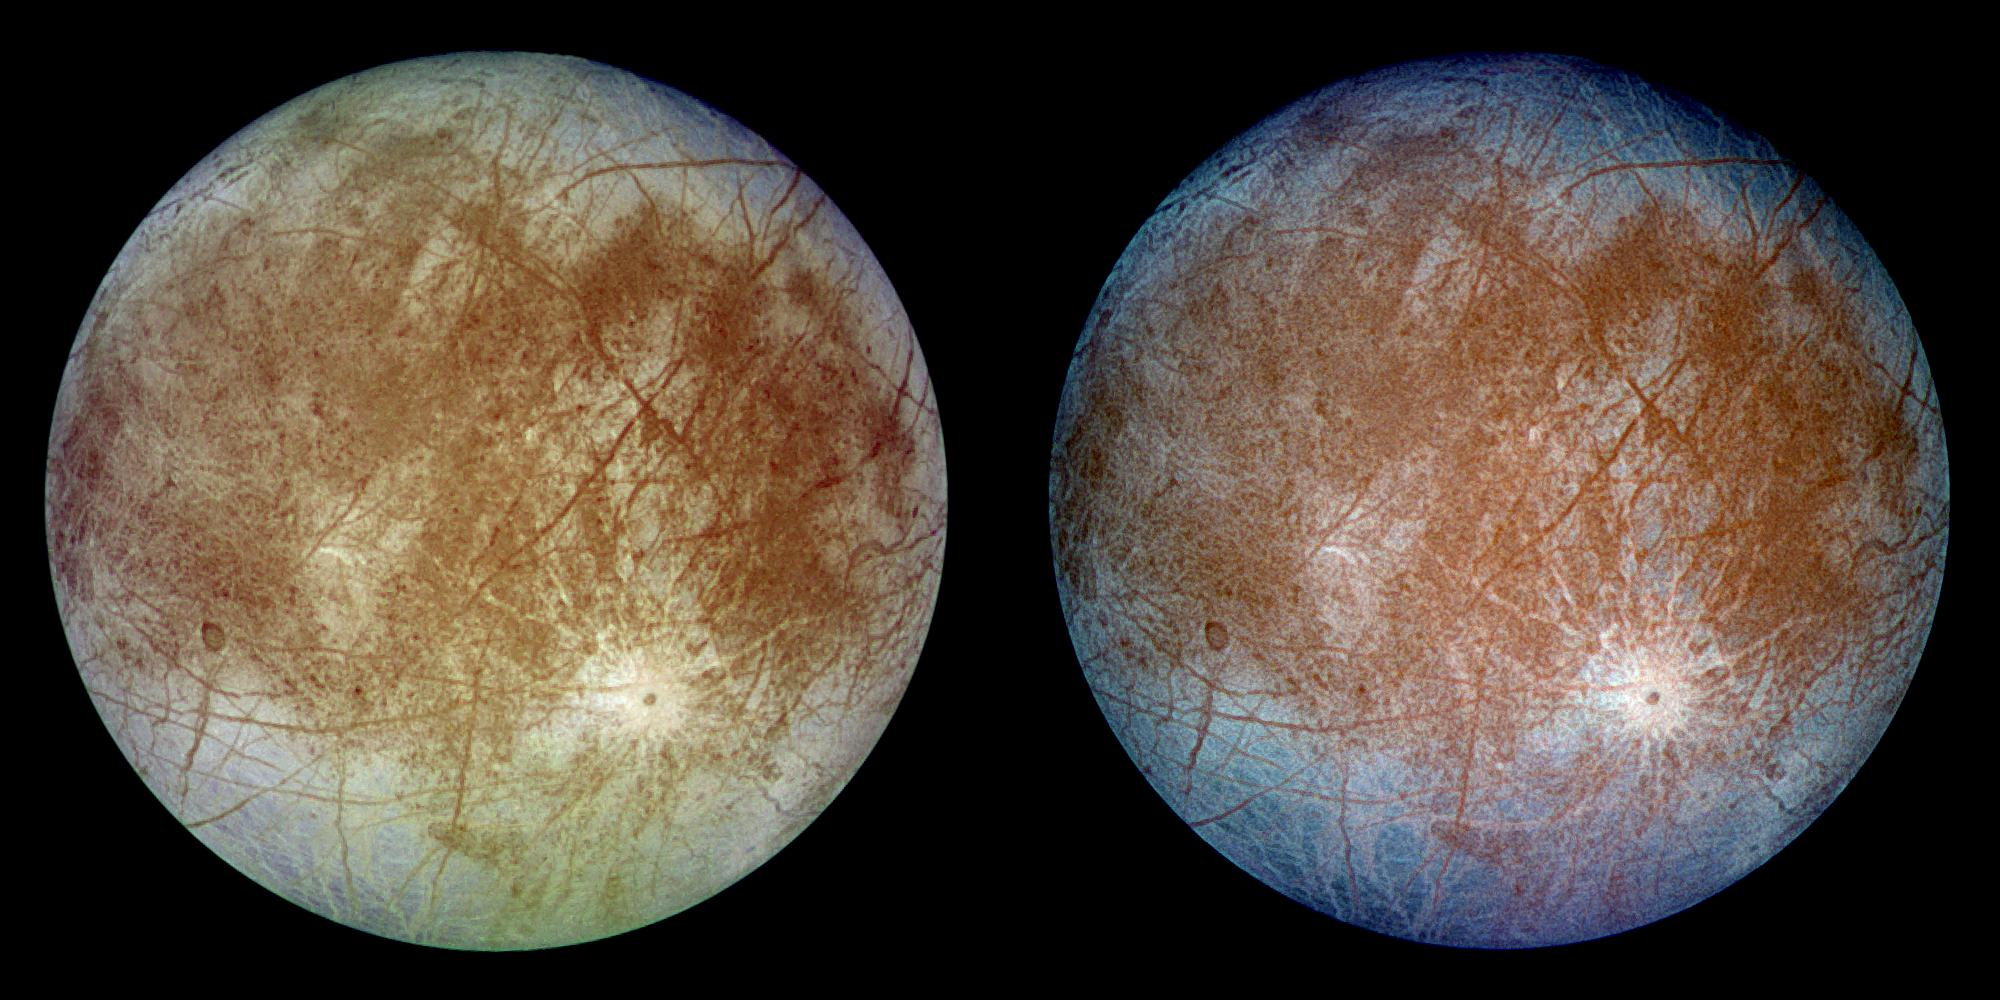 Image credit: NASA/JPL-Caltech/DLR